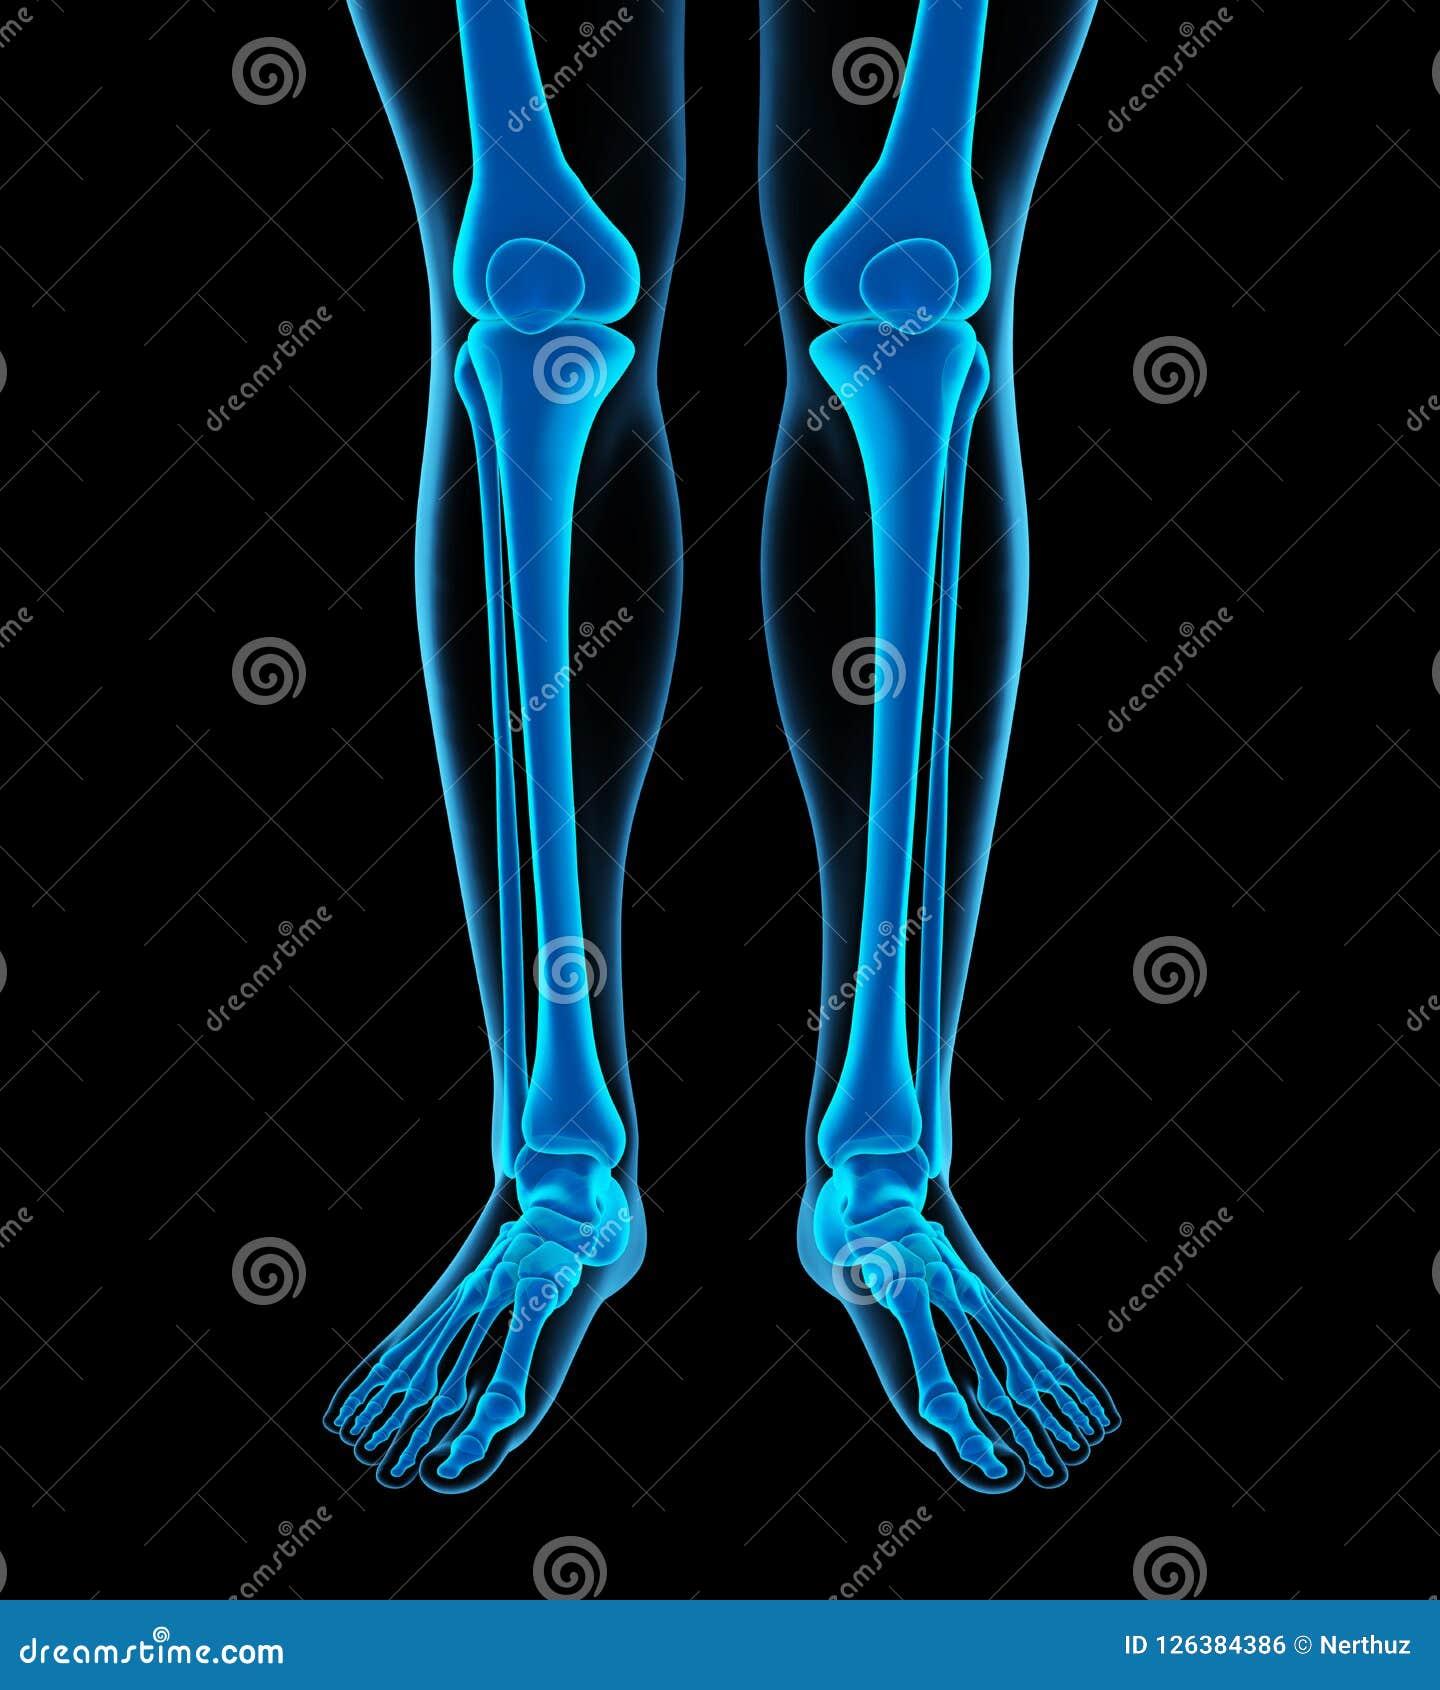 Human Leg Bones Anatomy Stock Illustration Illustration Of Bone